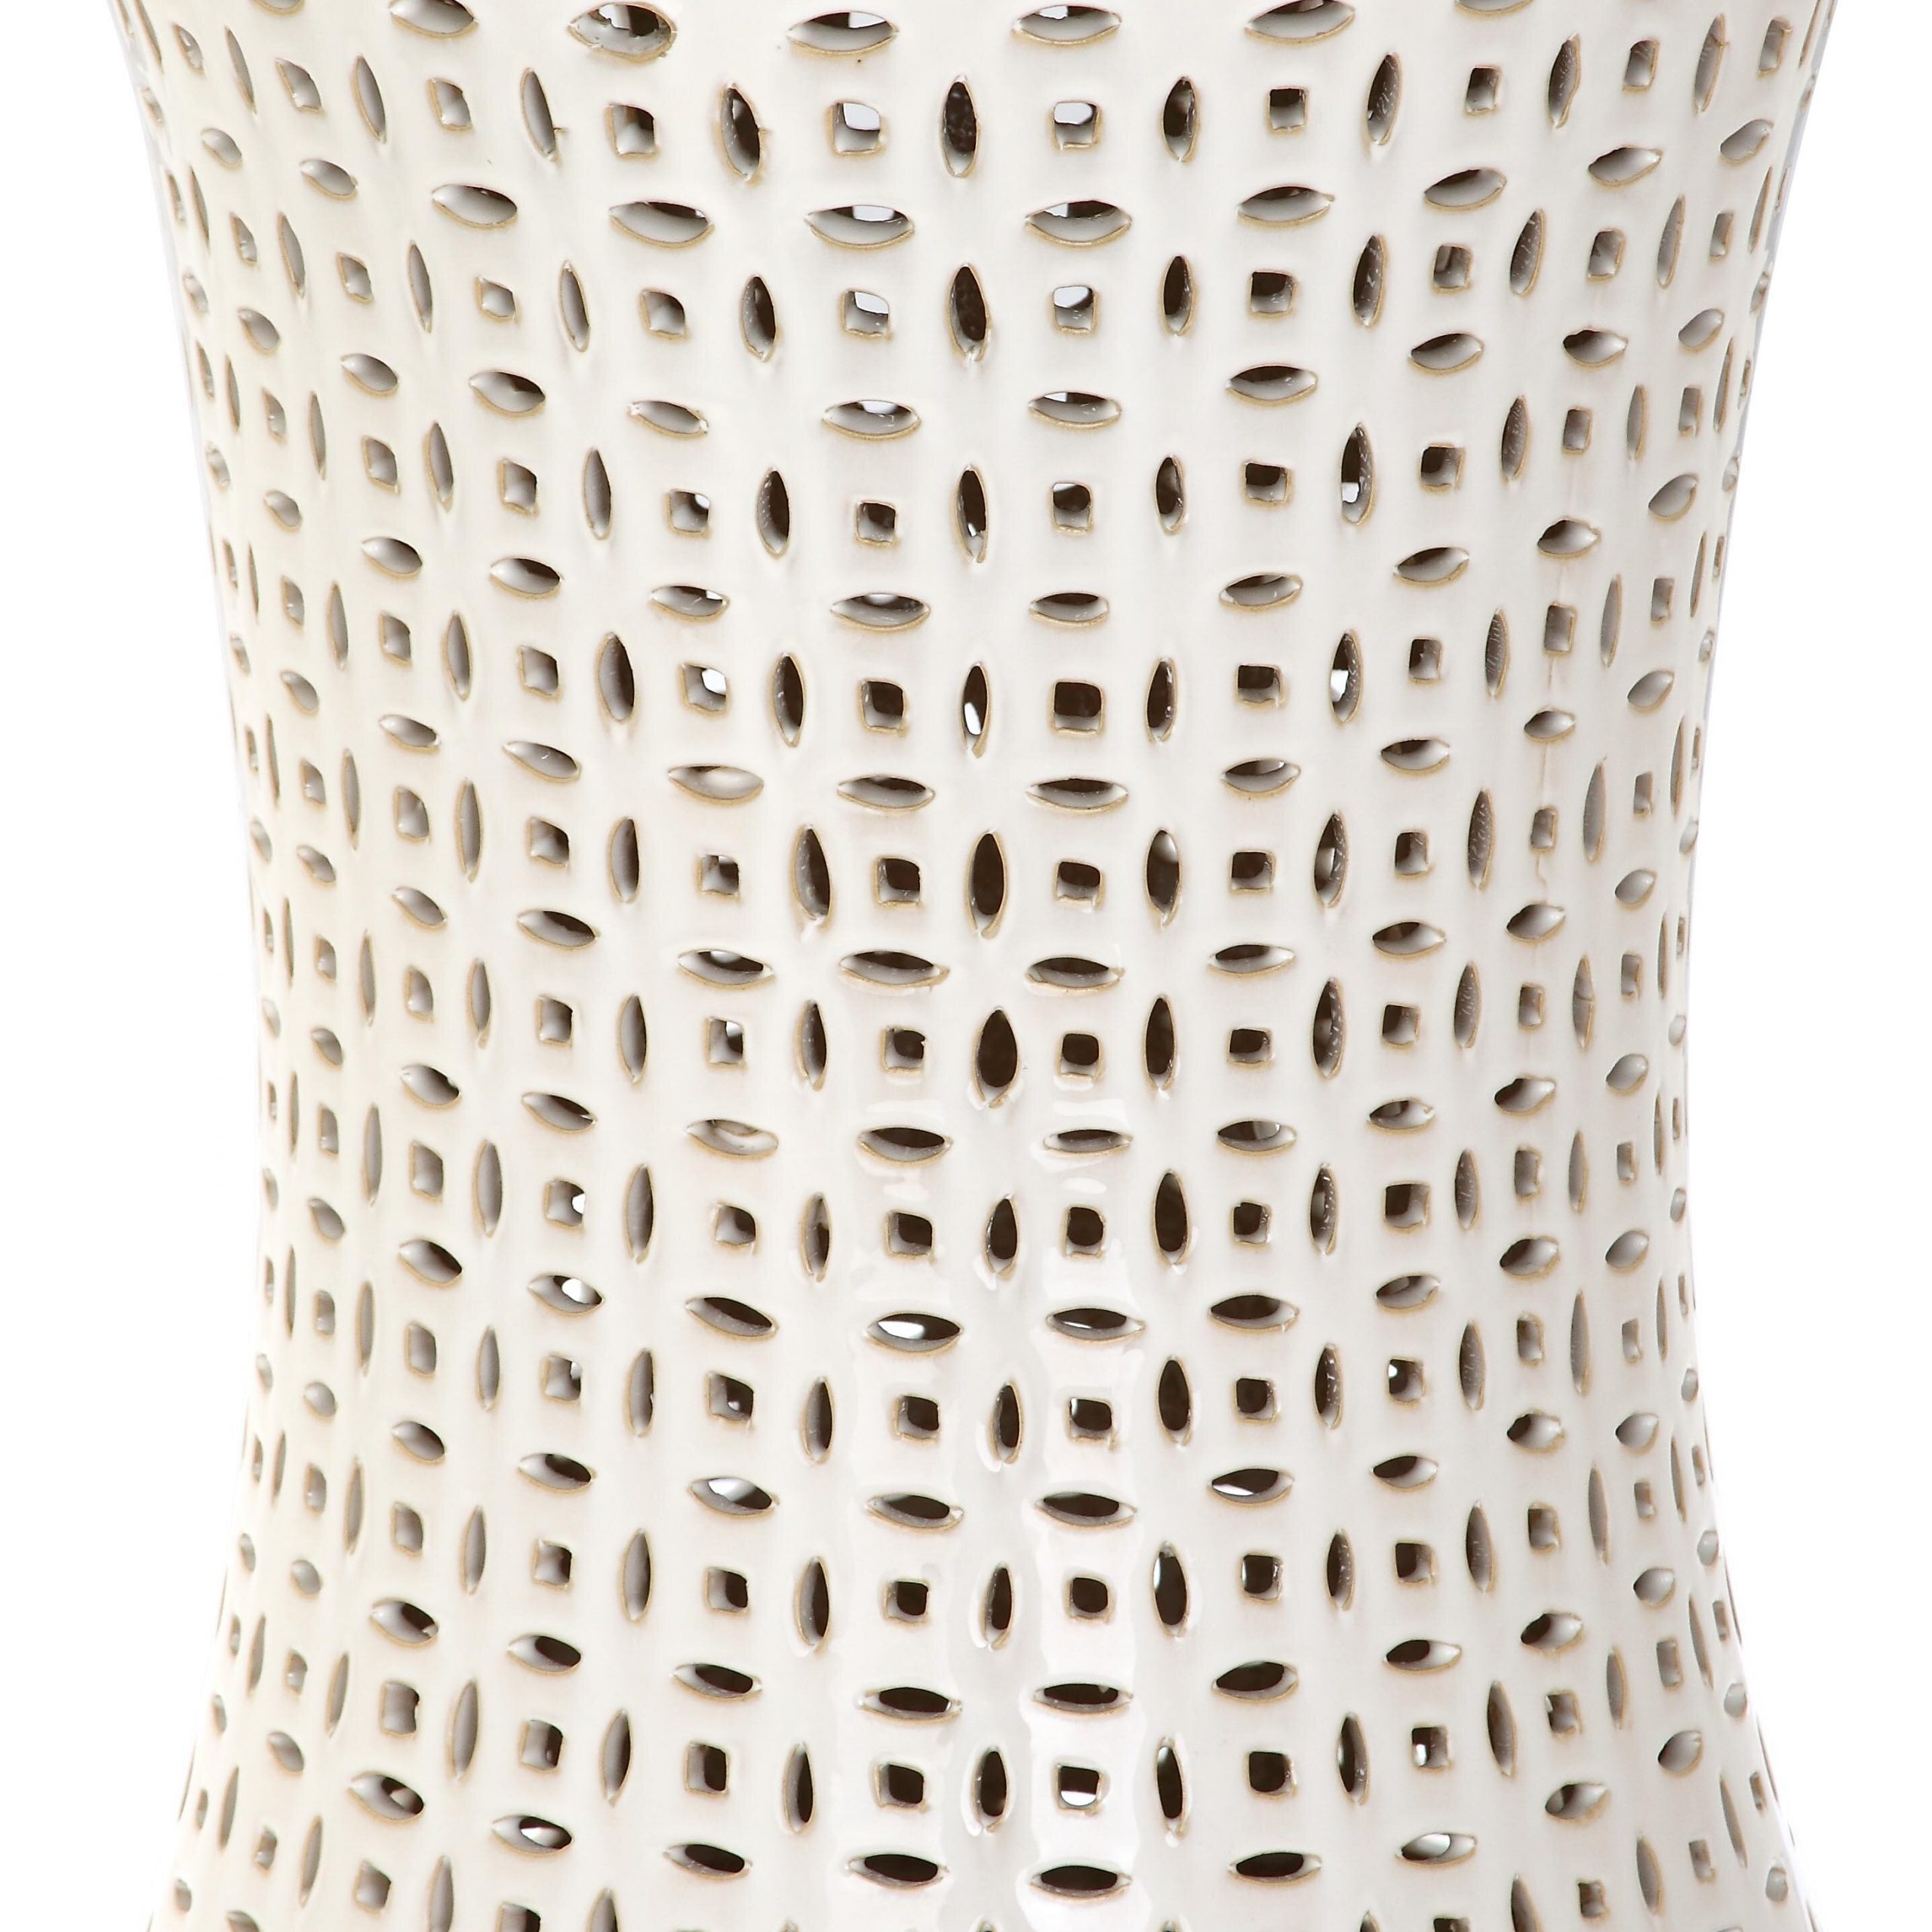 Zenobia Ceramic Garden Stool Regarding Jadiel Ceramic Garden Stools (View 19 of 25)